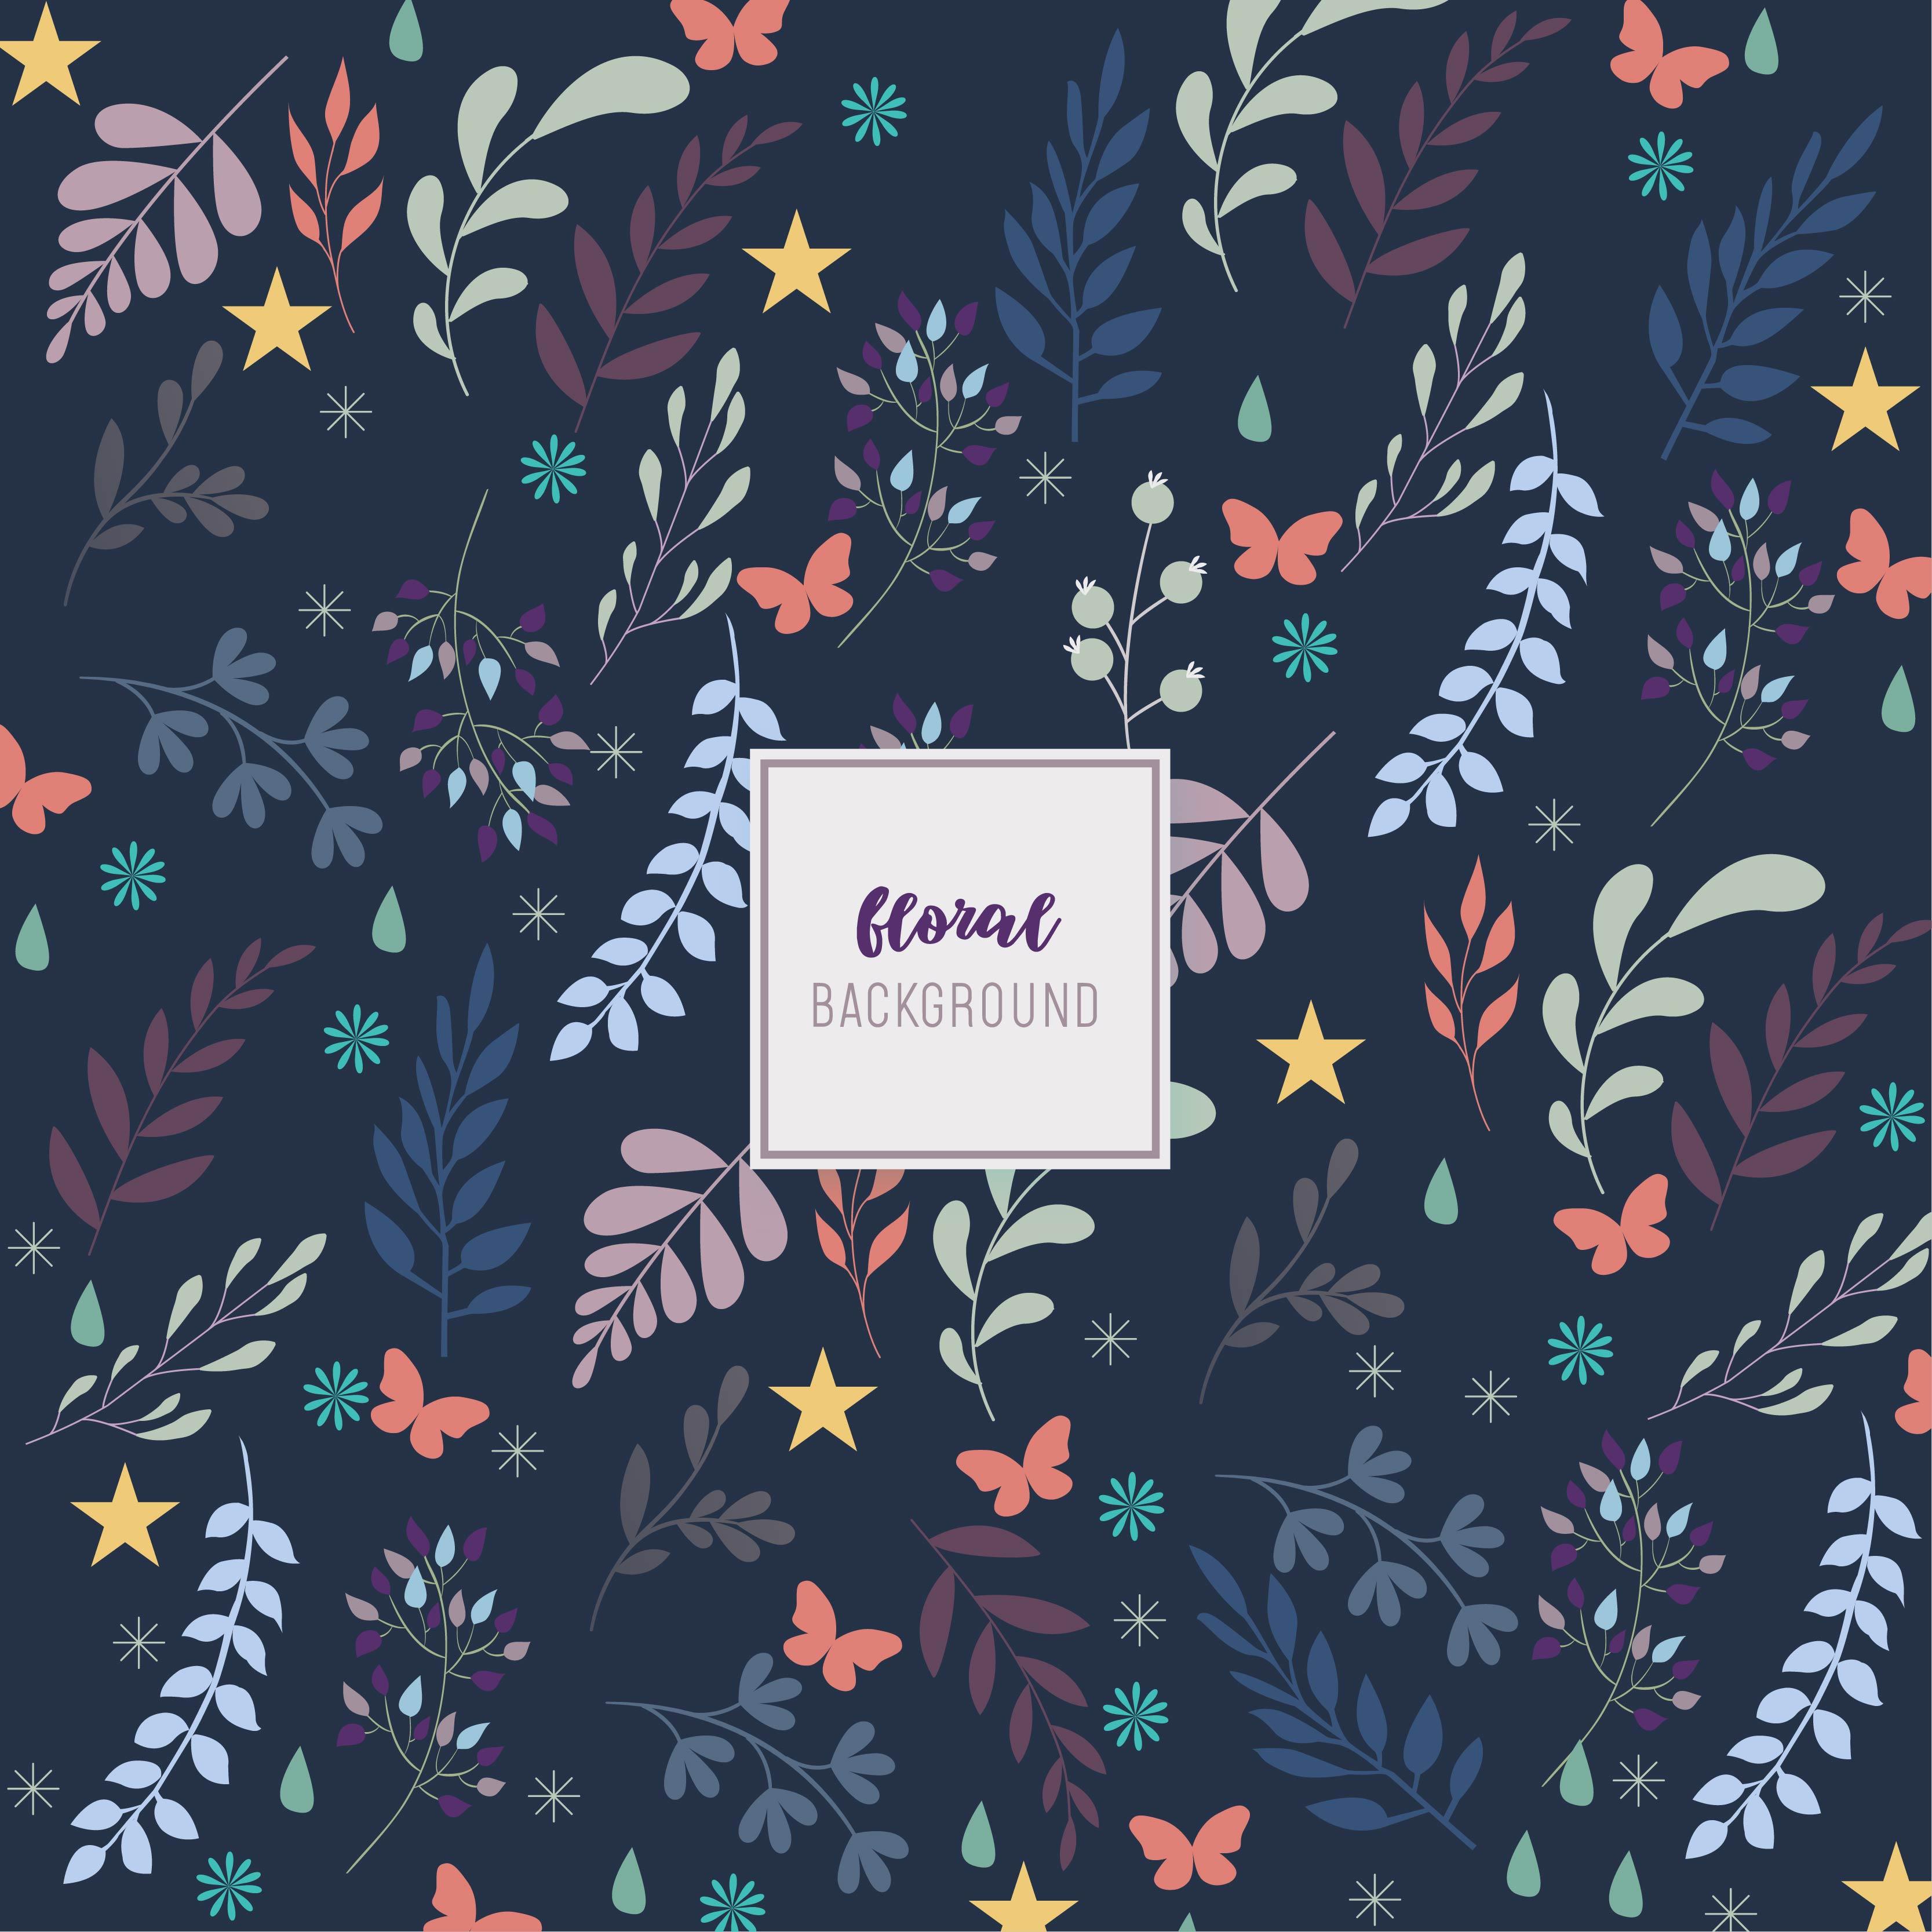 Navy Floral Background Design Download Free Vectors Clipart